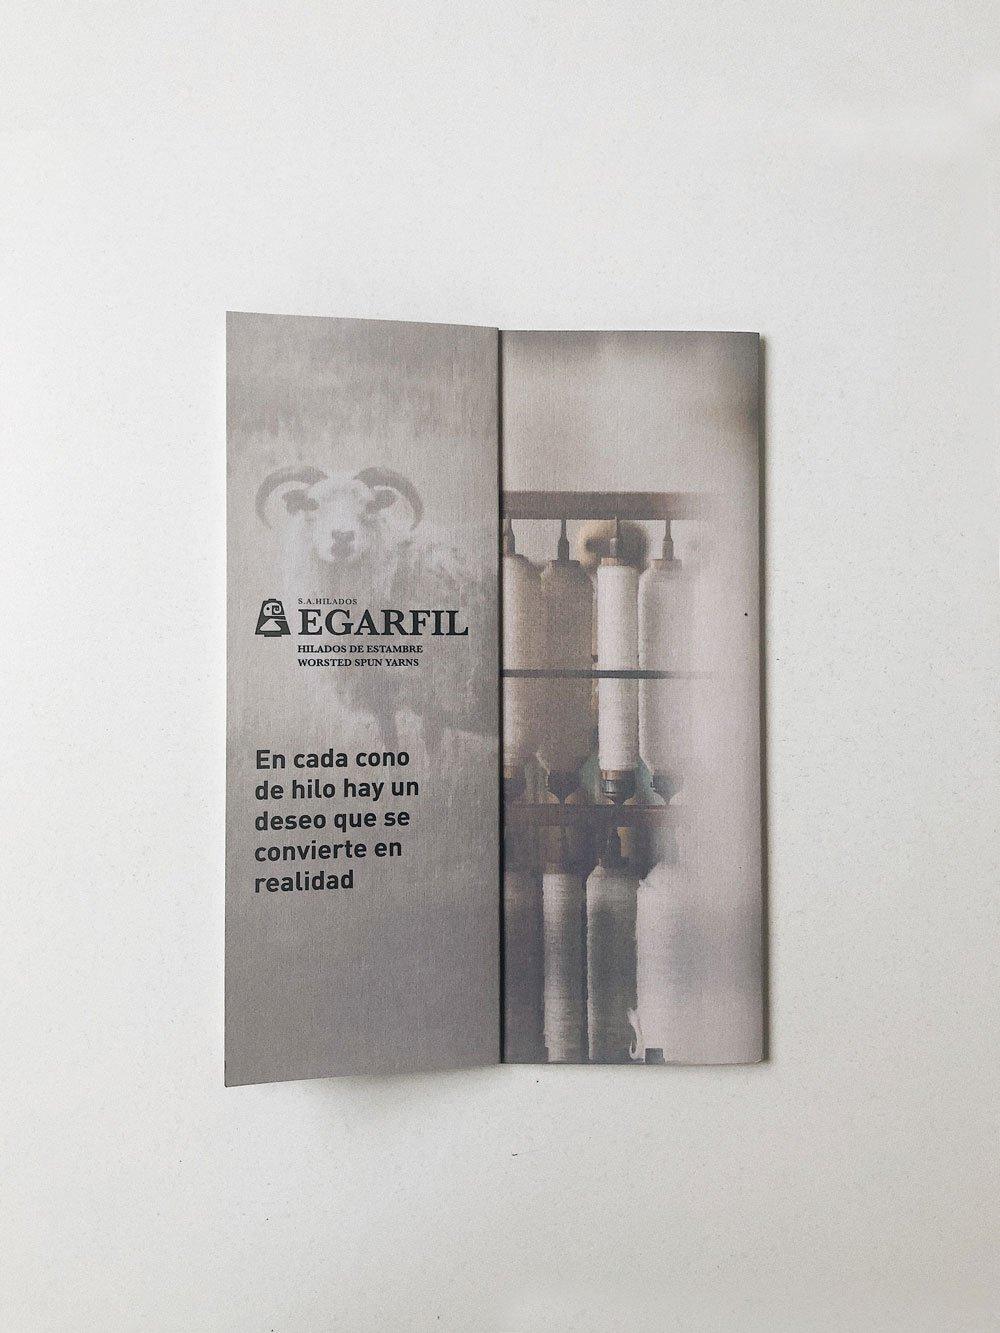 Catálogo Hilados Egarfil - Textil Terrassa